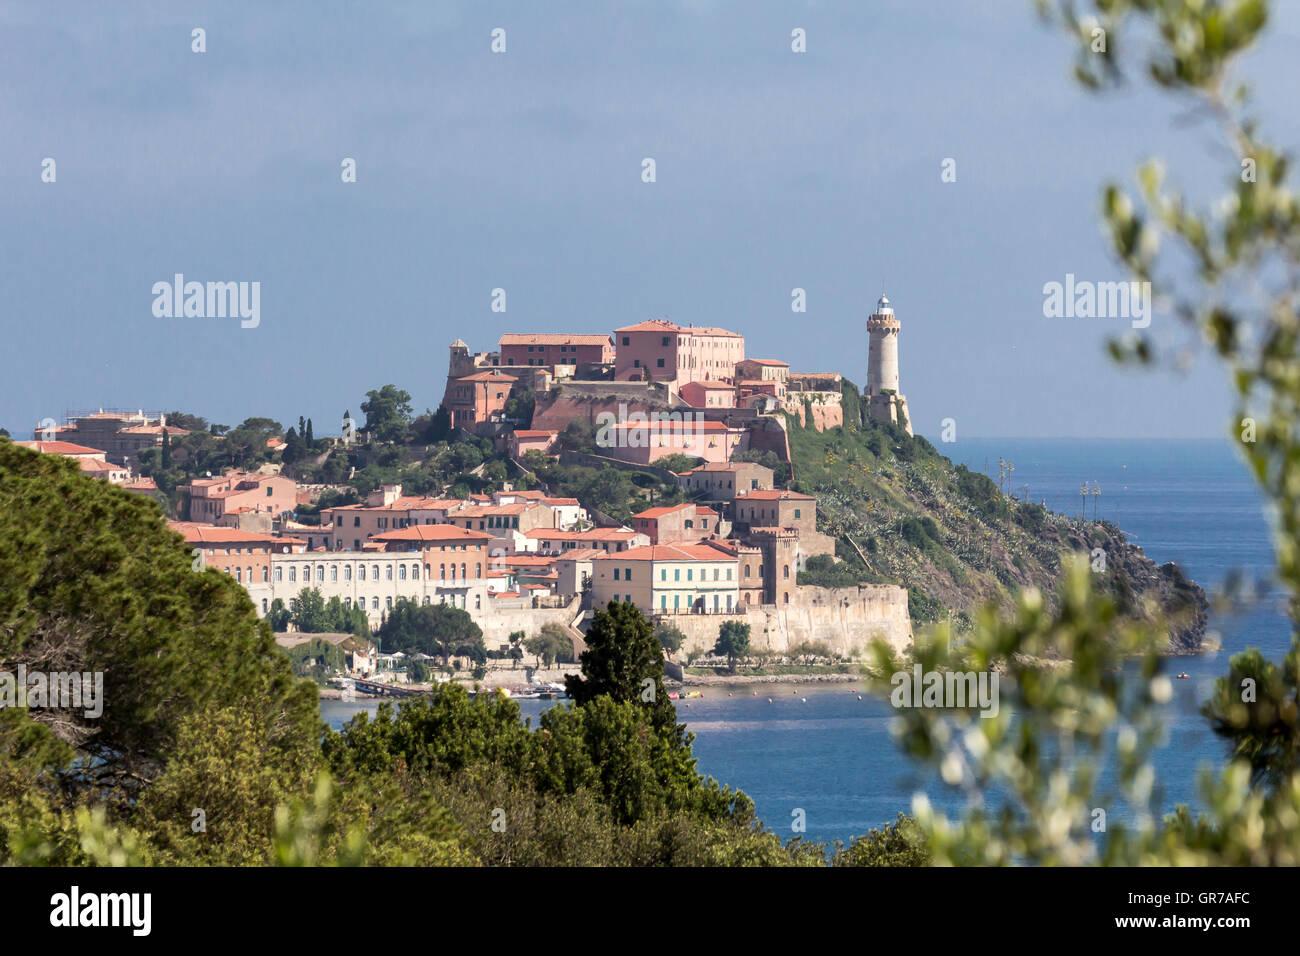 Portoferraio, Star Fort Forte Stella On Elba Island, Tuscany, Italy, Europe - Stock Image